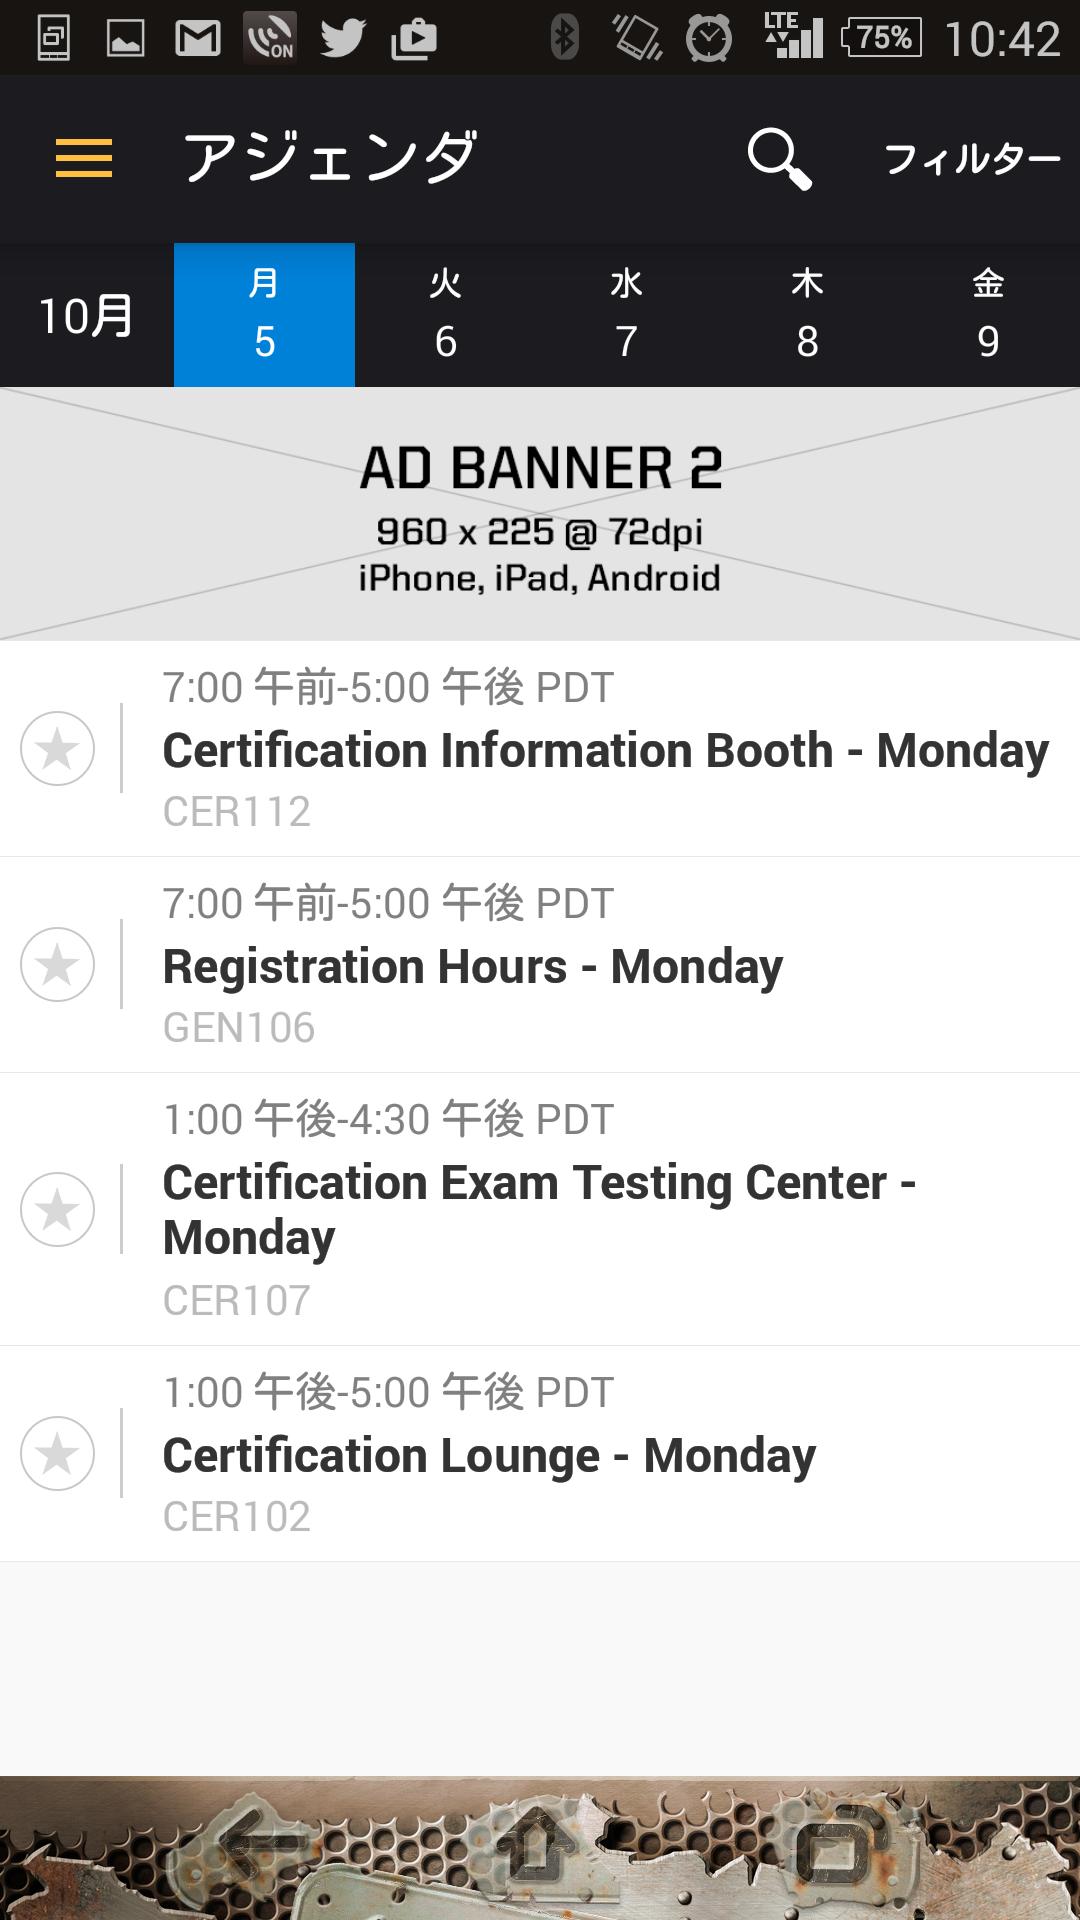 aws-reinvent-2015-event-app_11